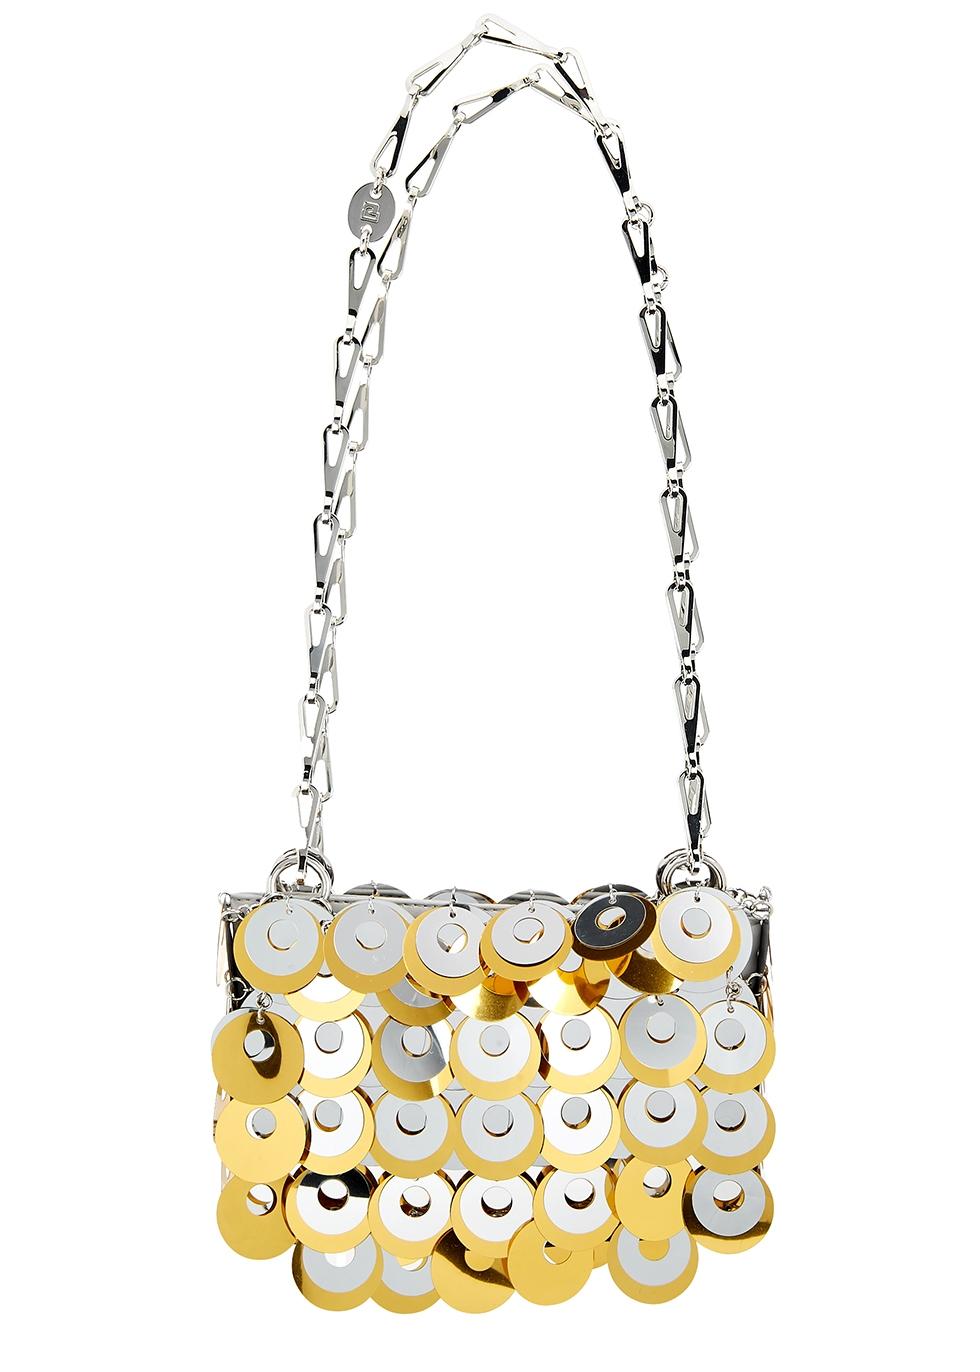 Sparkle Nano gold and silver-tone shoulder bag